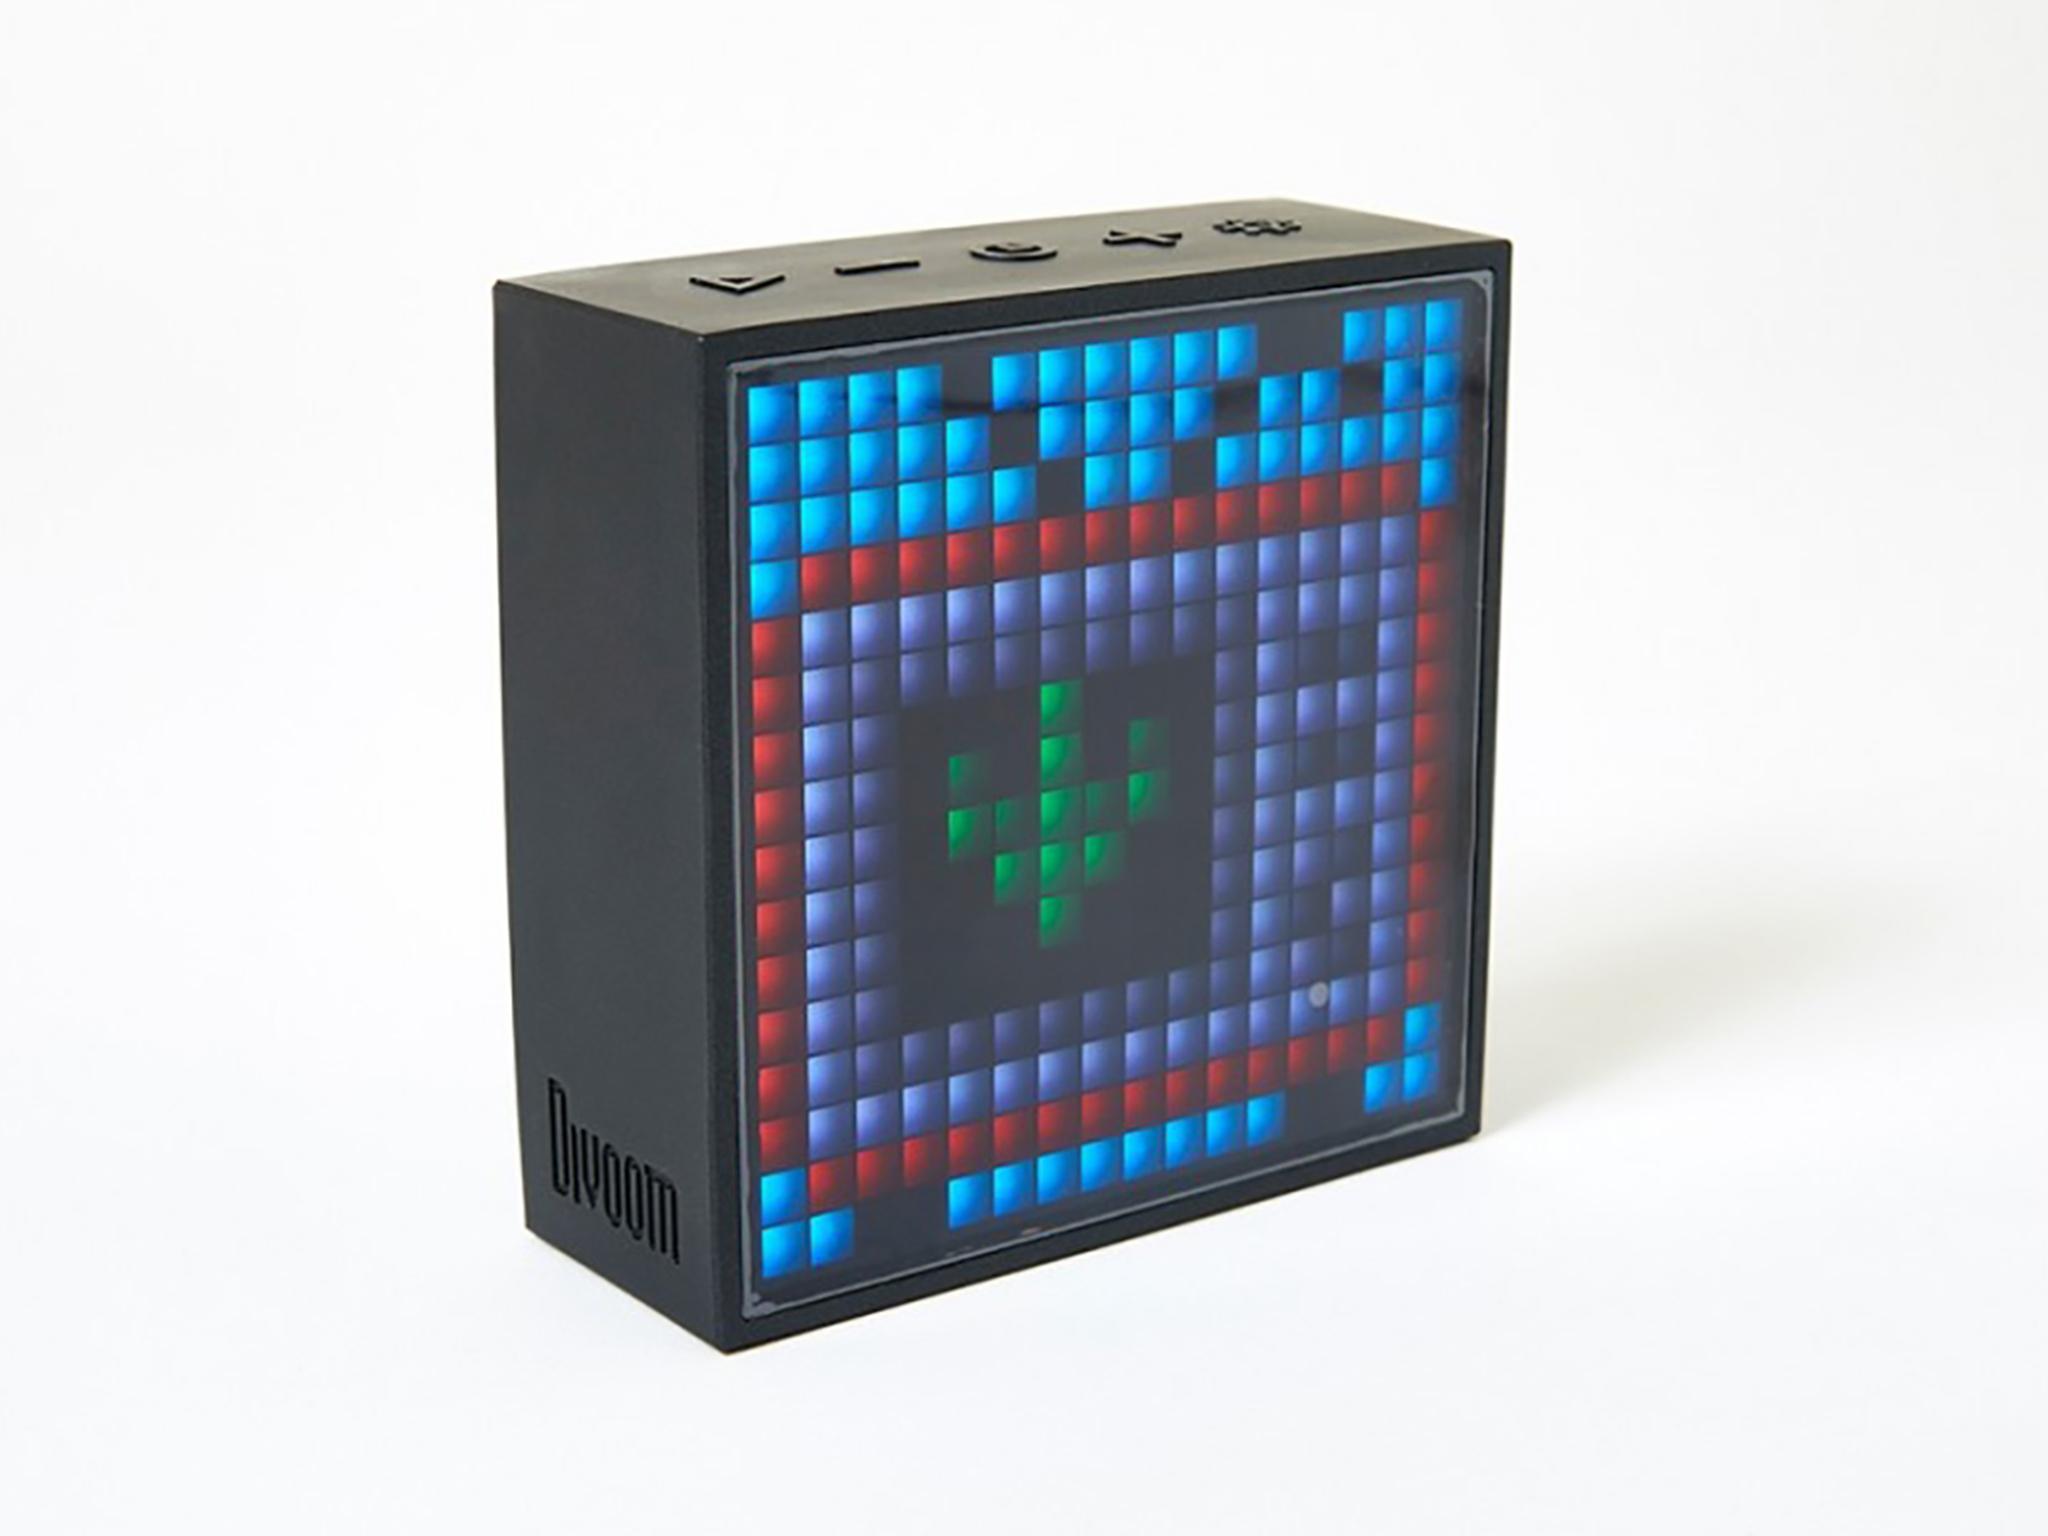 Timebox Evo speaker